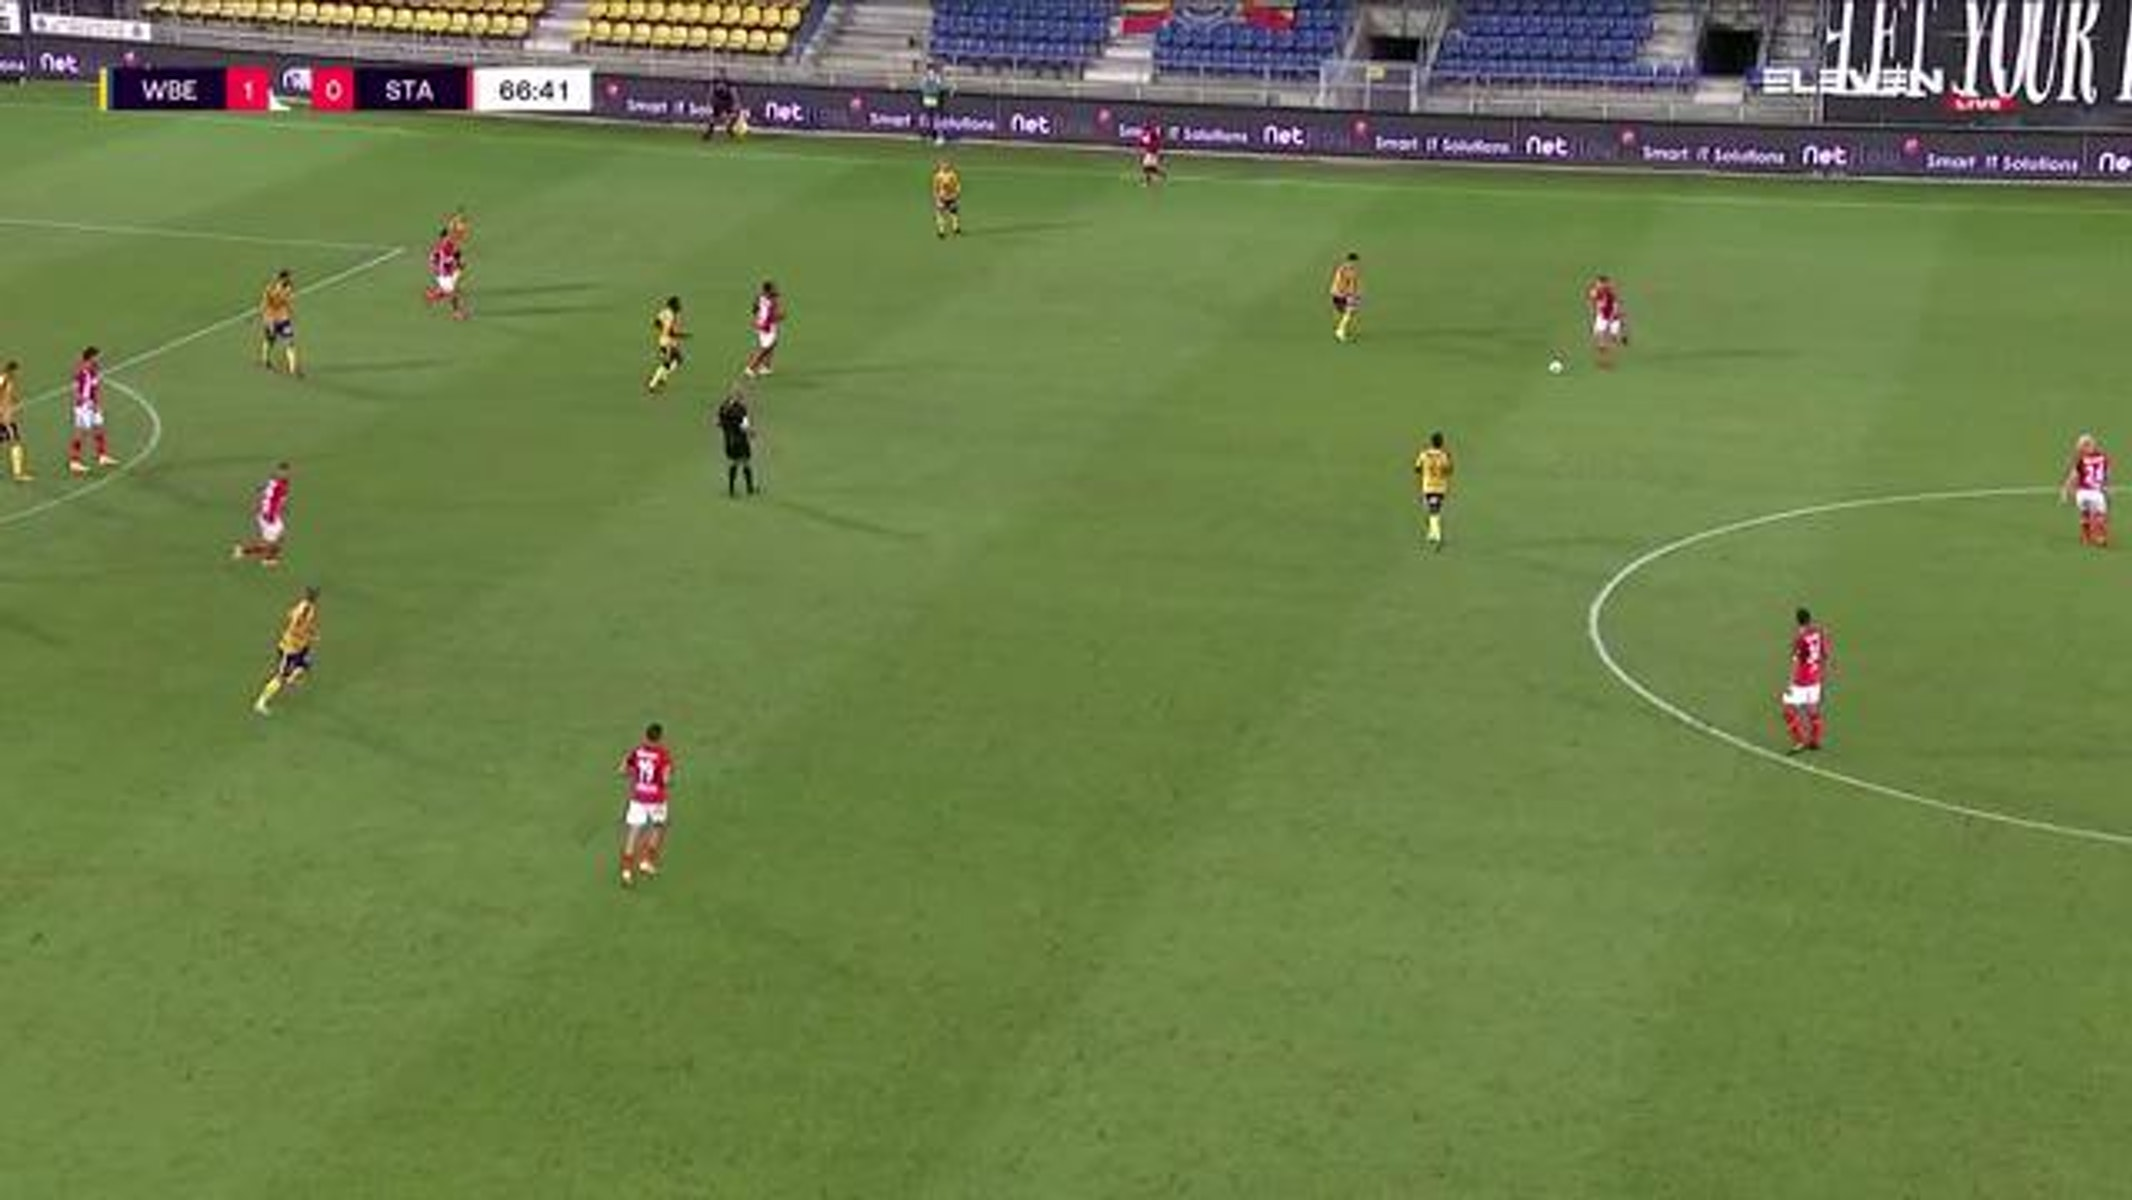 Doelpunt Selim Amallah (Waasland-Beveren vs. Standard de Liège)